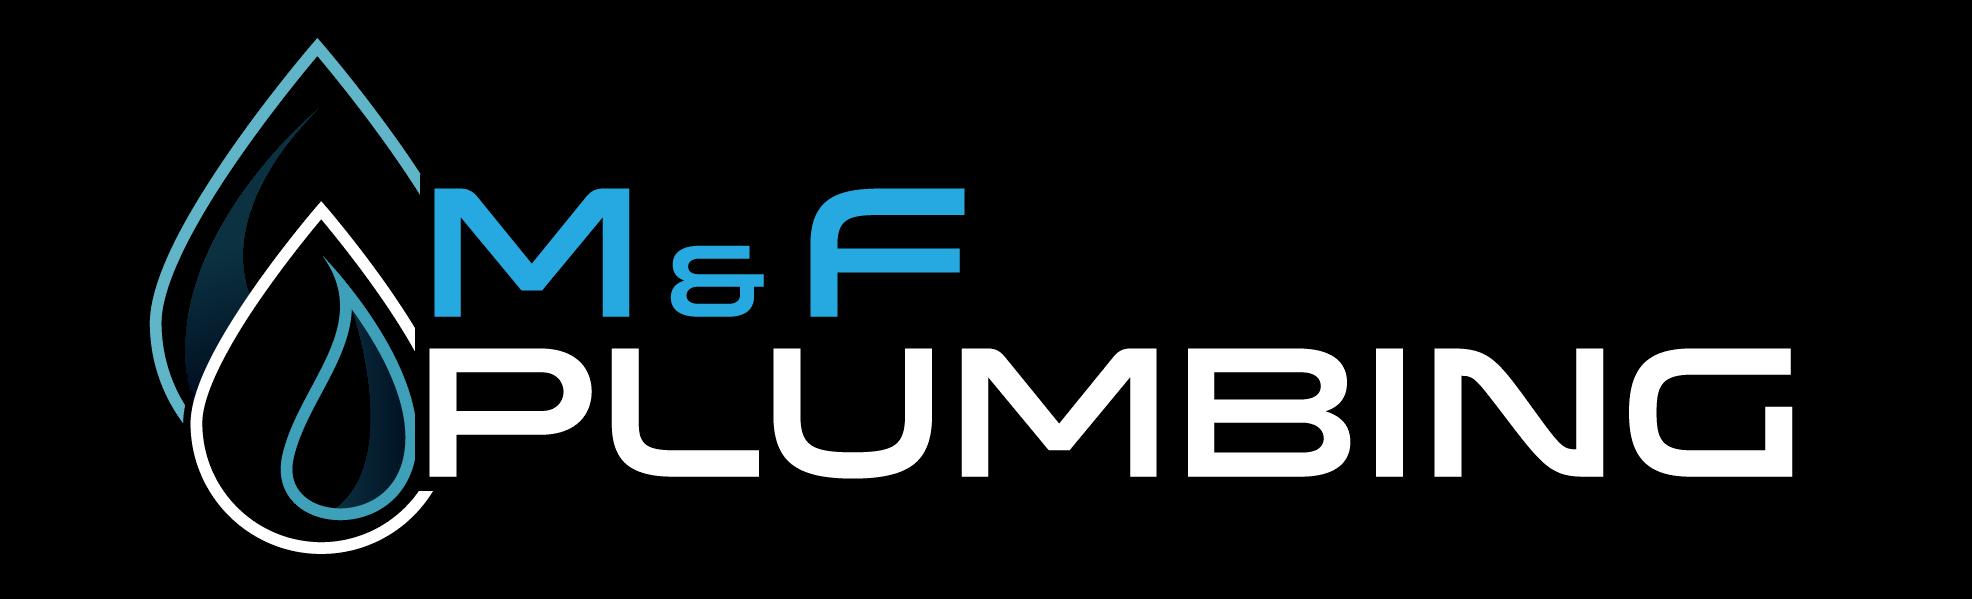 M & F Plumbing